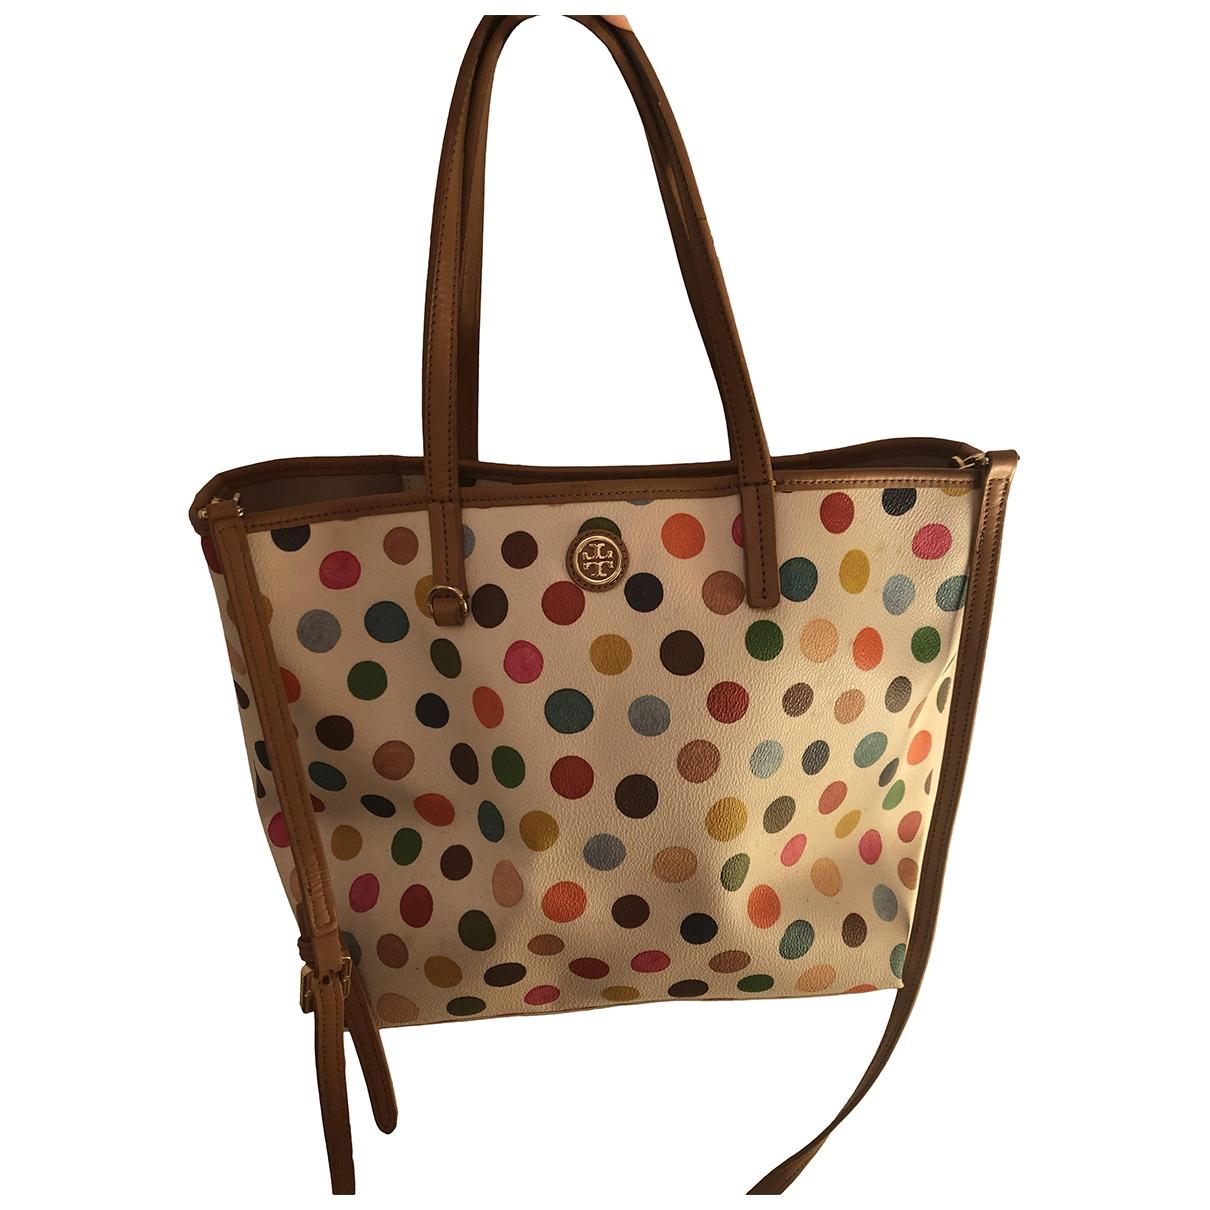 Tory Burch \N Multicolour Leather handbag for Women \N